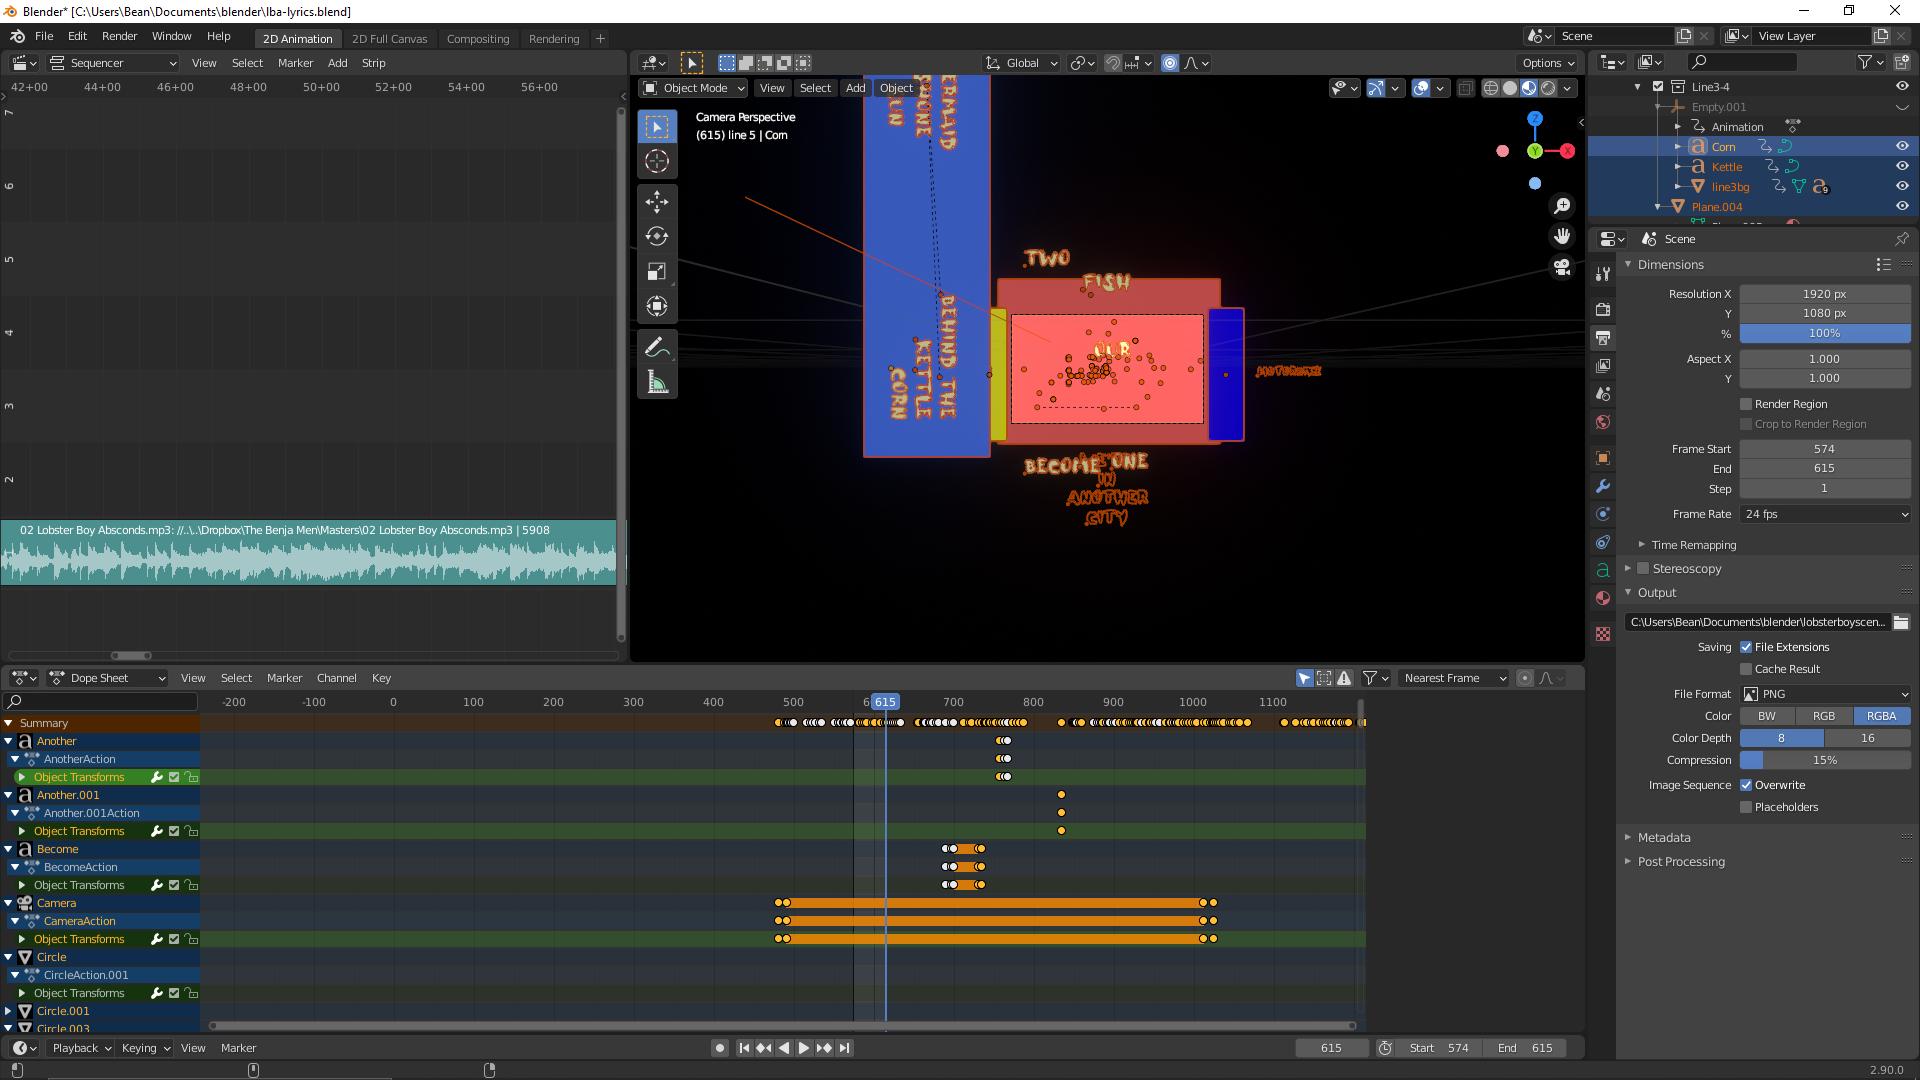 Screenshot of the blender project